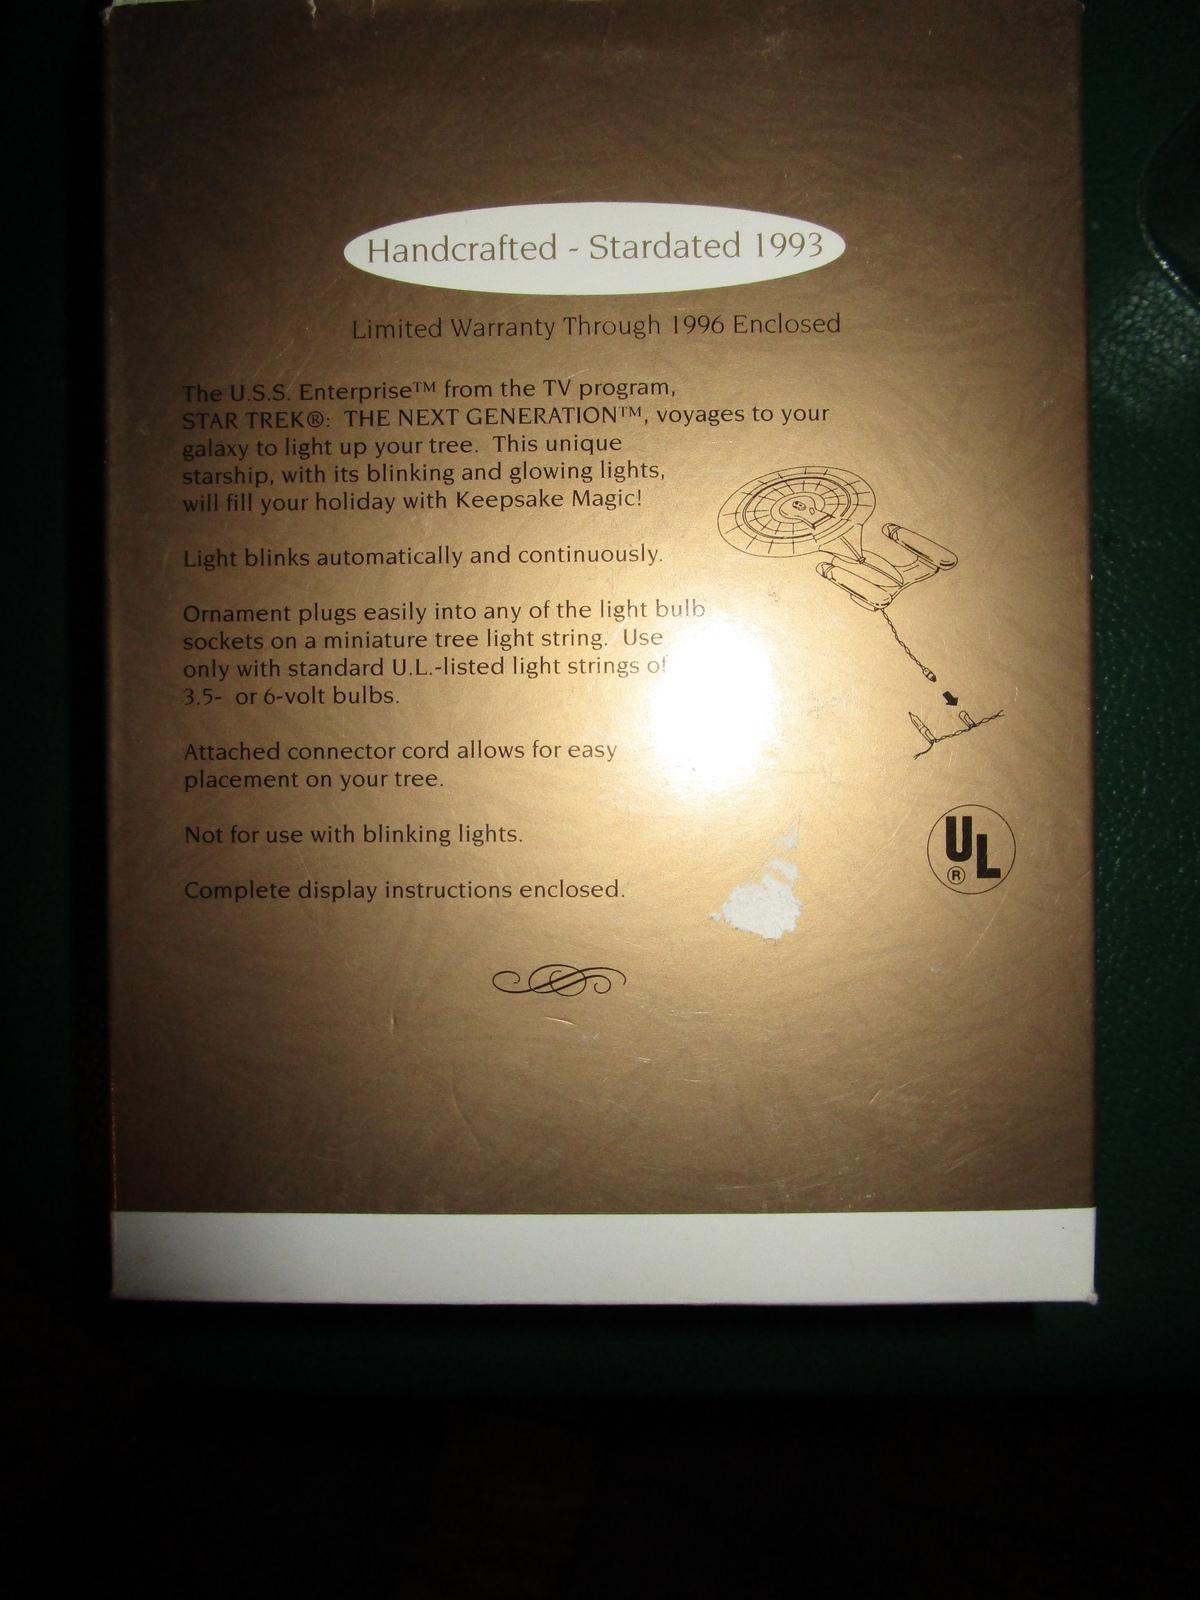 HALLMARK KEEPSAKE 1993 U.S.S. ENTERPRISE STAR TREK MAGIC ORNAMENT in ORIG BOX